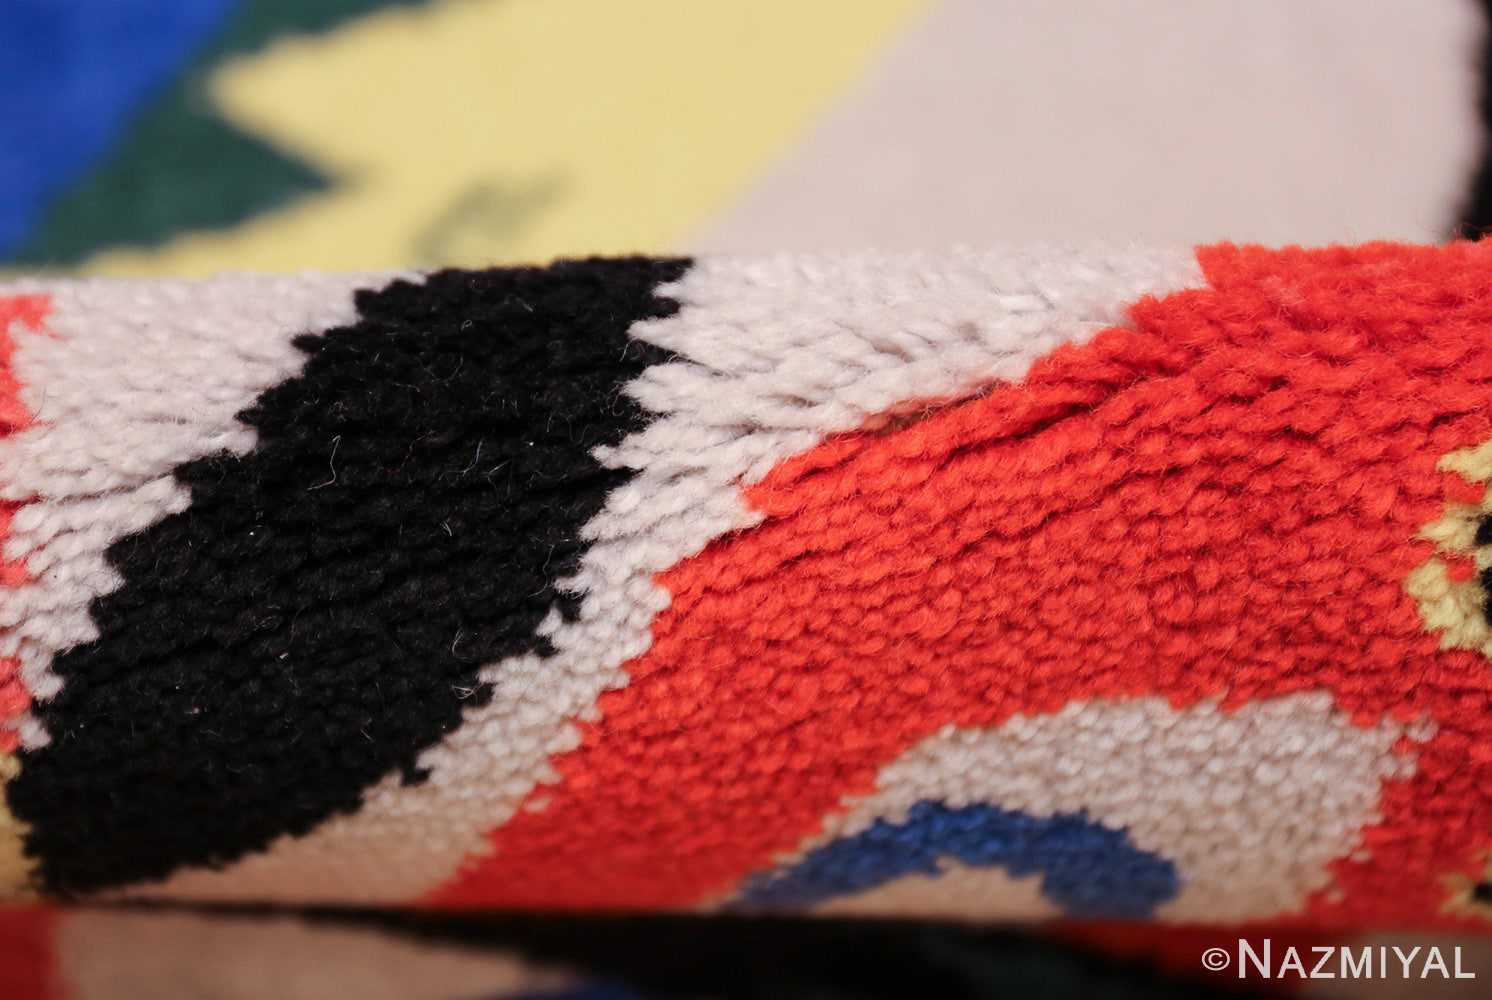 bauhaus rug inspired by kandinsky small worlds 47388 pattern edited Nazmiyal